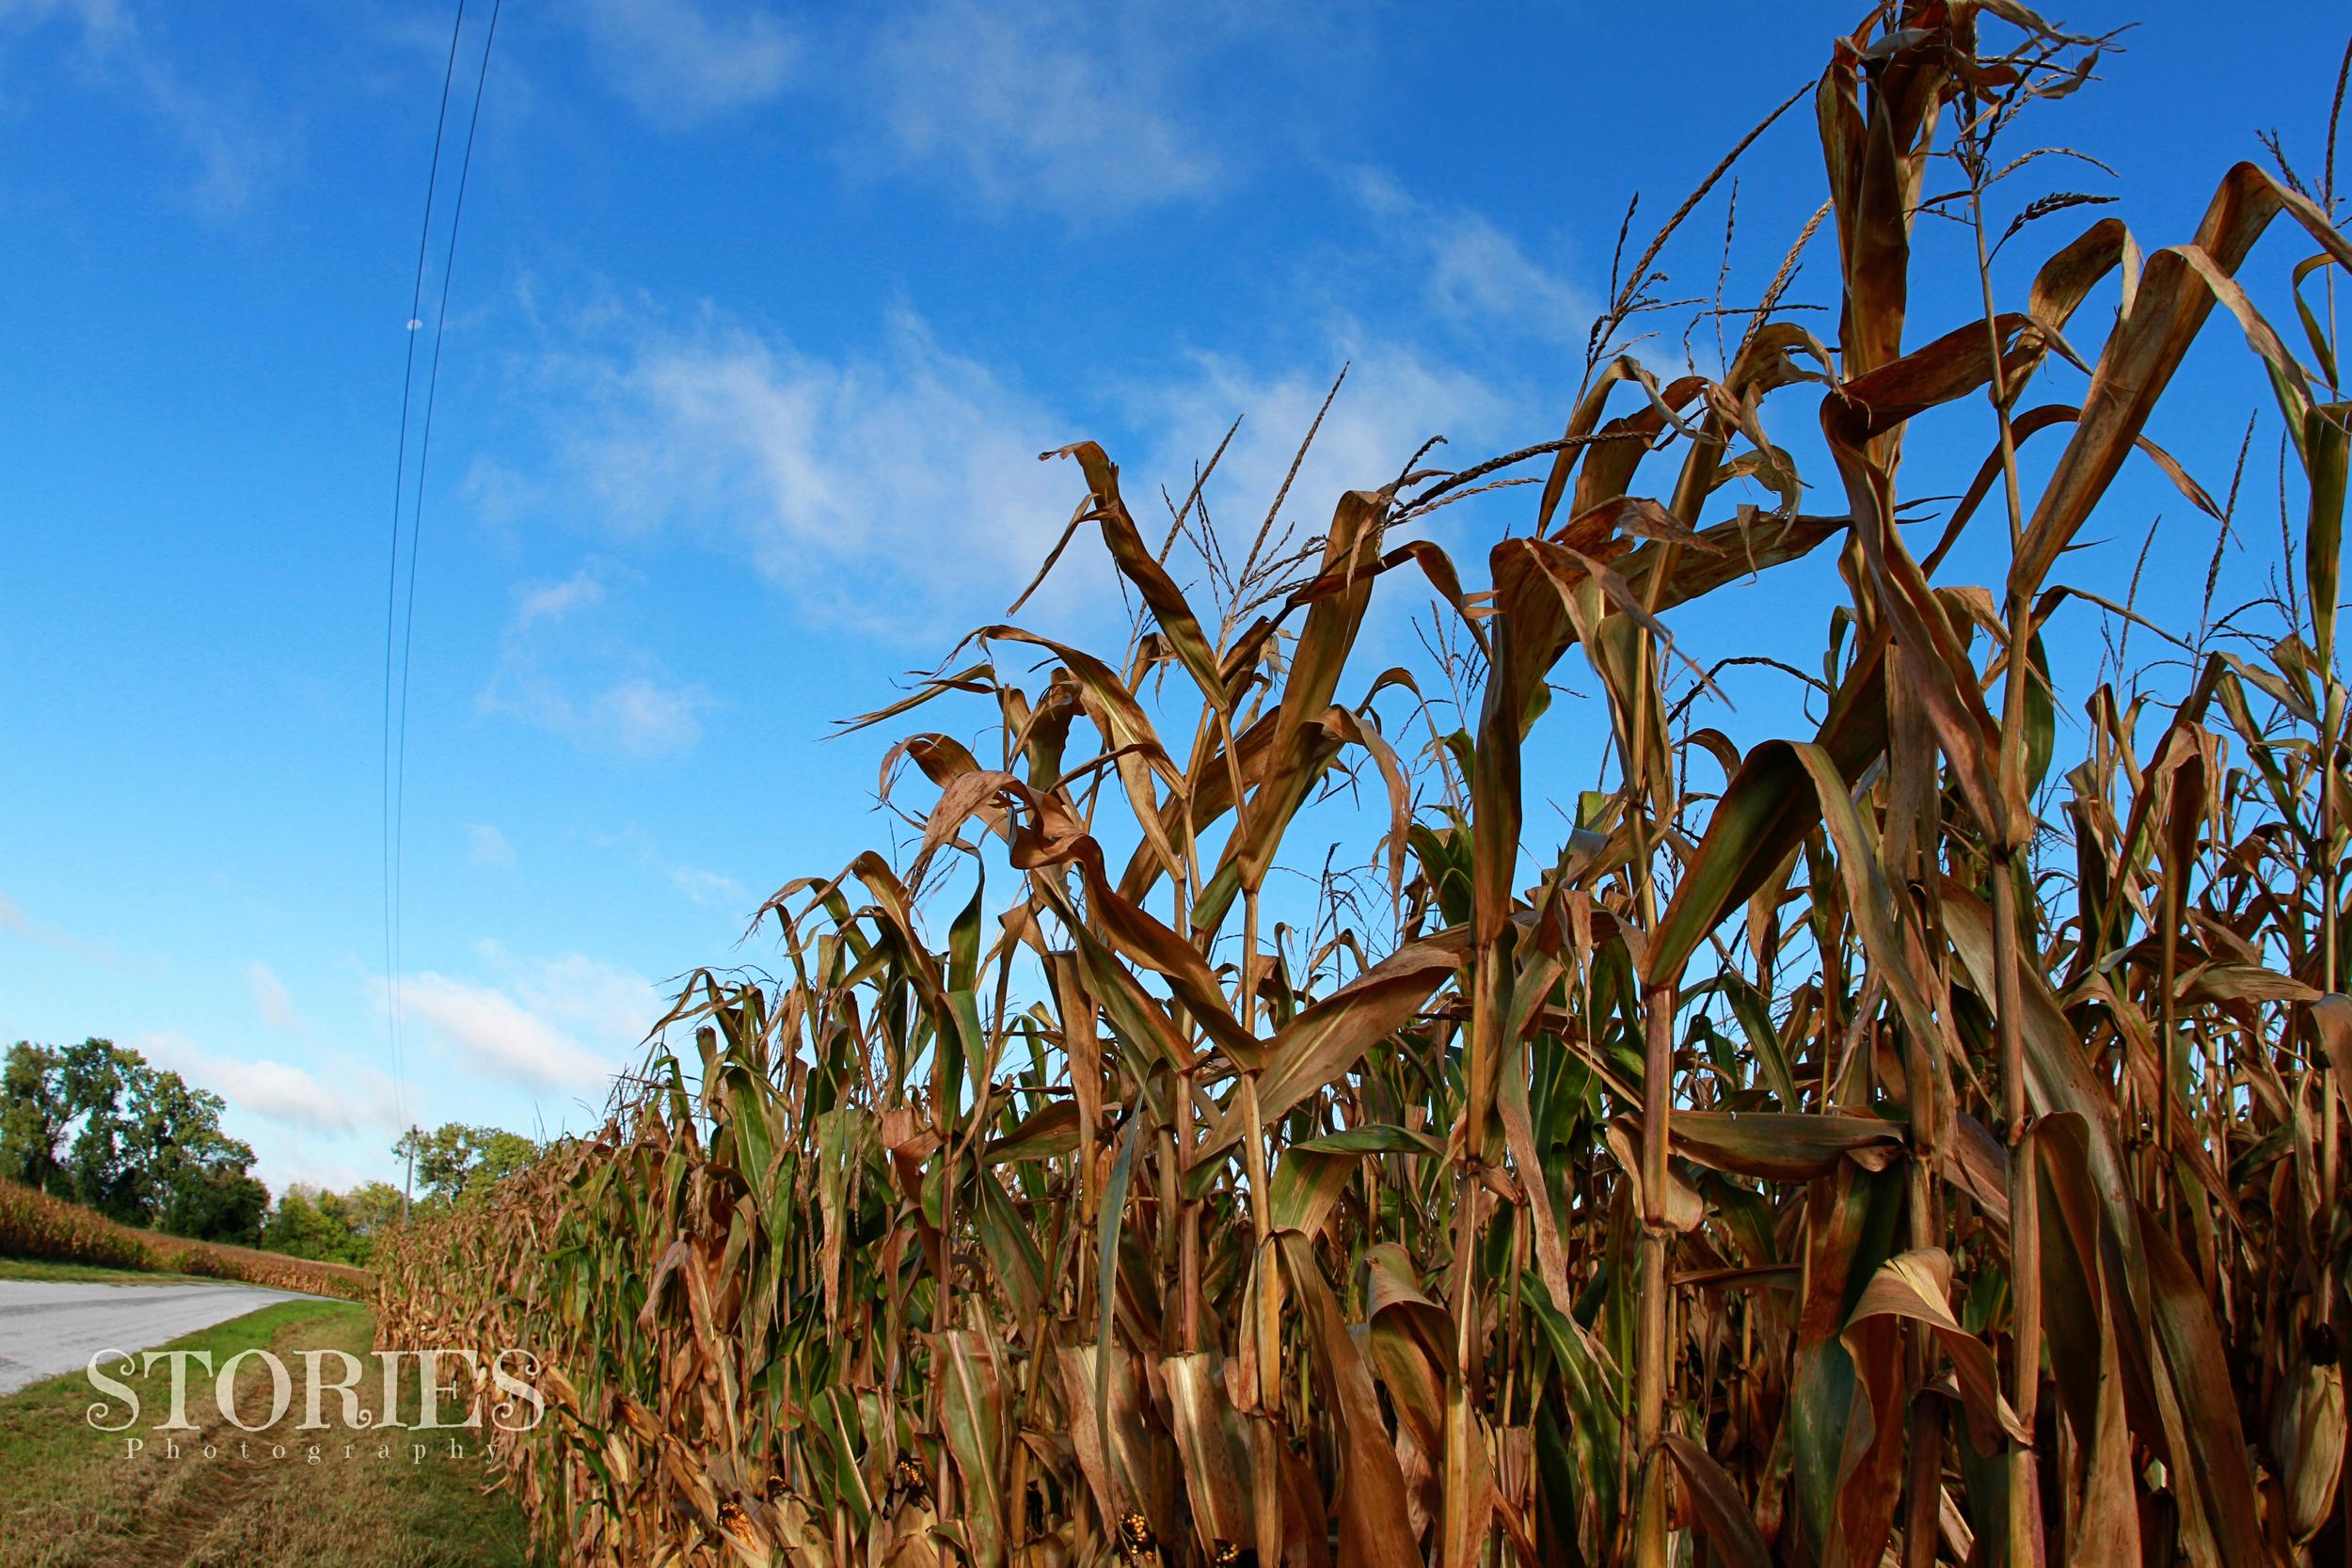 Remington Ride corn fields